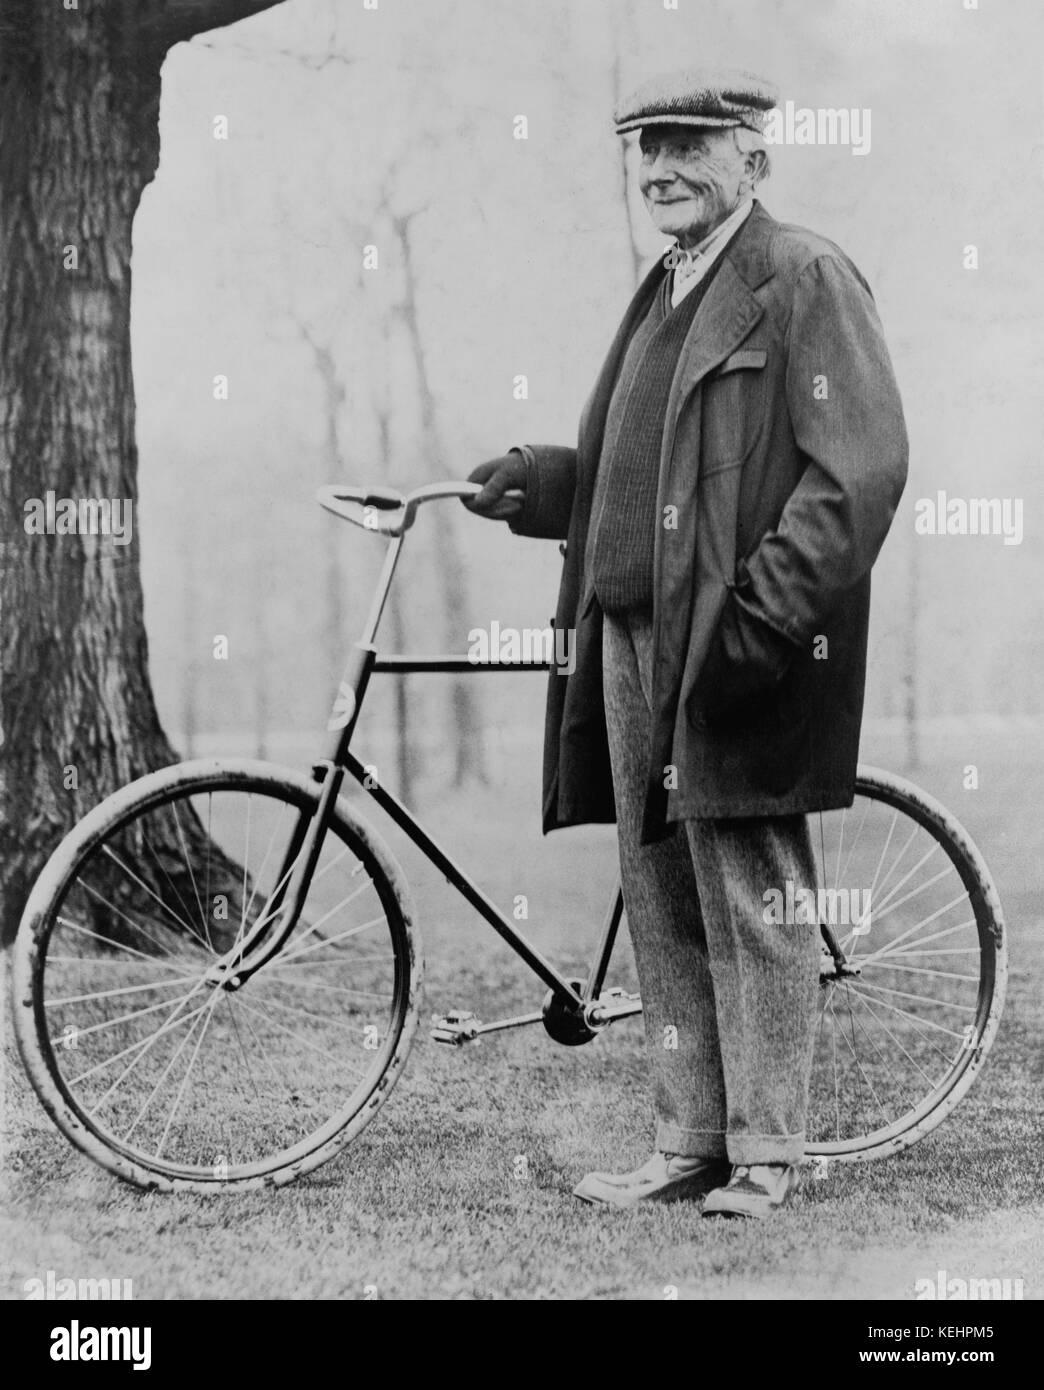 John D. Rockefeller (1839-1937),Portrait standing with Bicycle,1913 - Stock Image